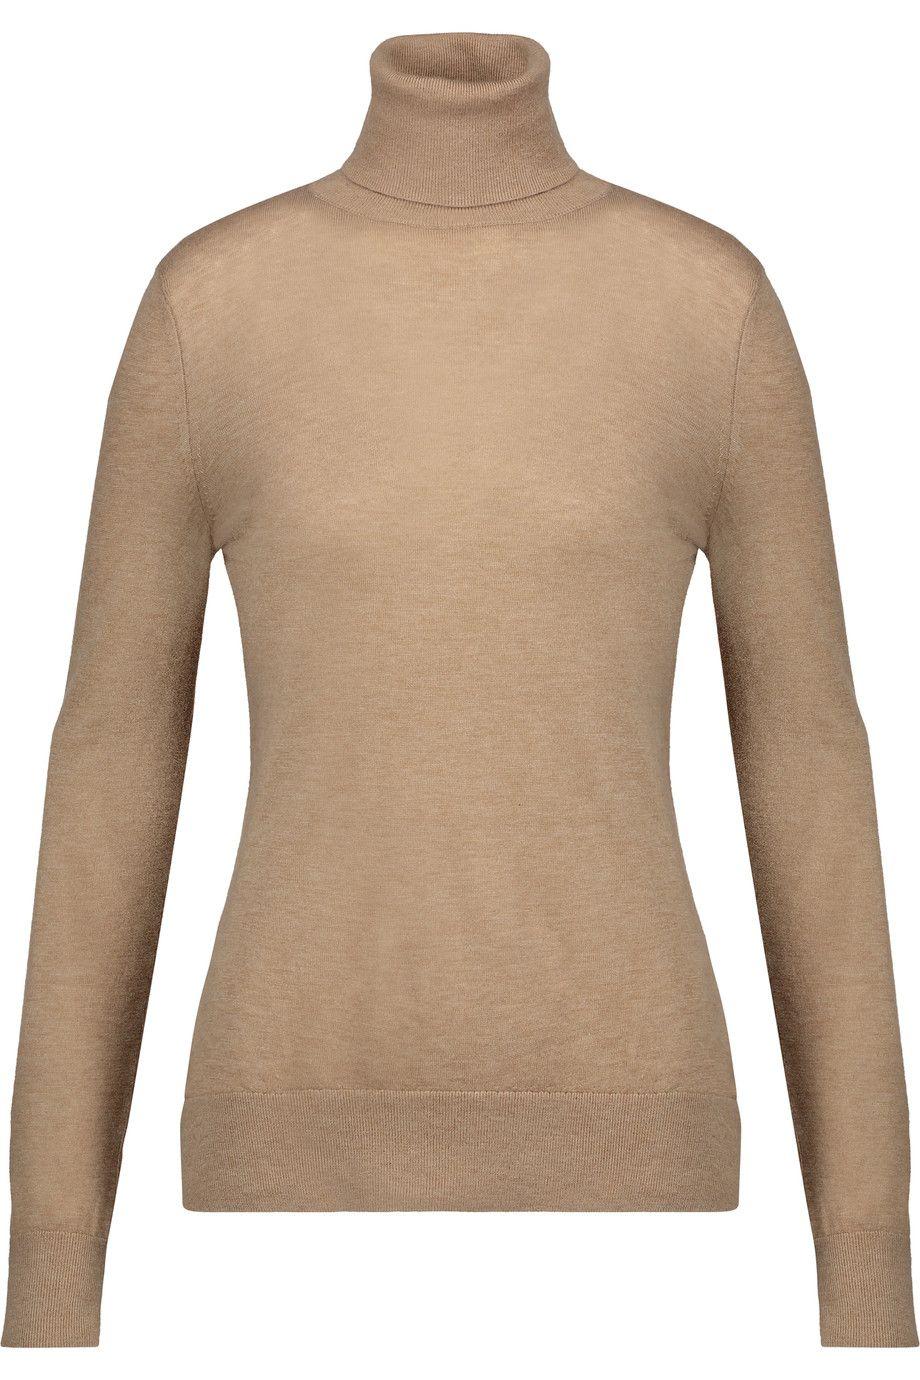 A.P.C. Judith Cashmere Turtleneck Sweater.  a.p.c.  cloth  sweater ... 8336eaa6df